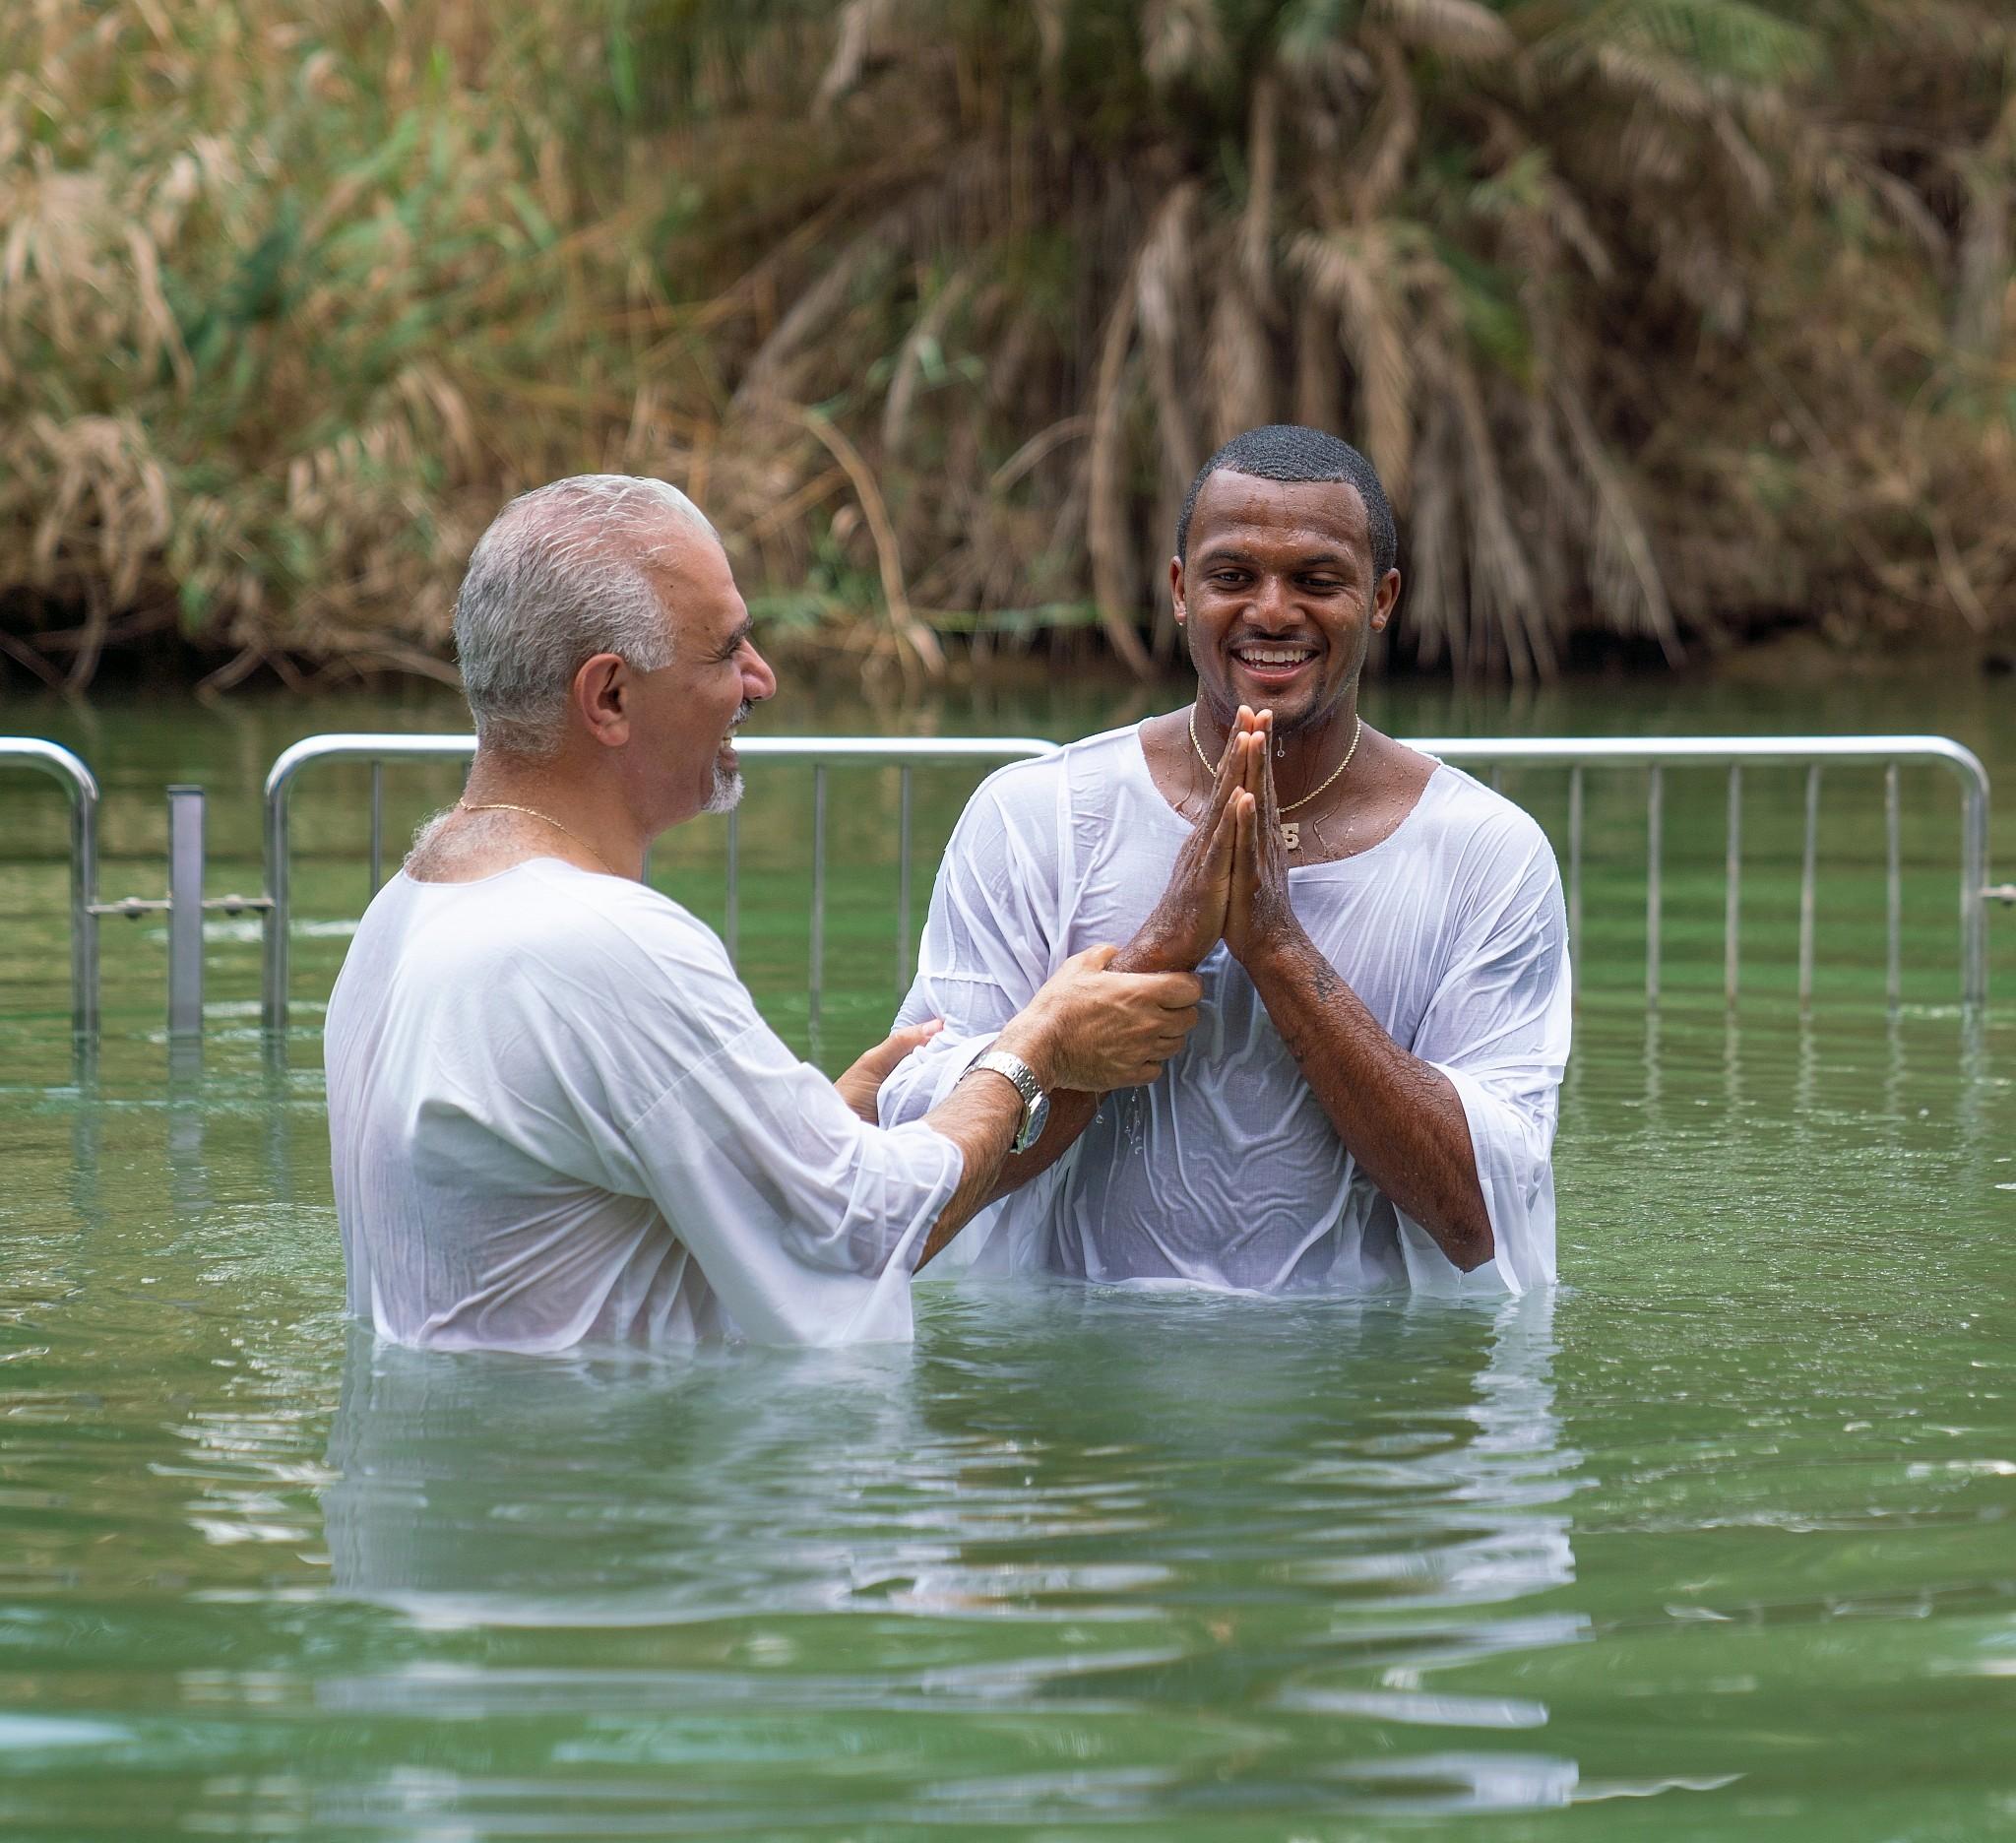 58bafe29980 Houston Texans all-star quarterback Deshaun Watson (right) getting baptized  in the Jordan